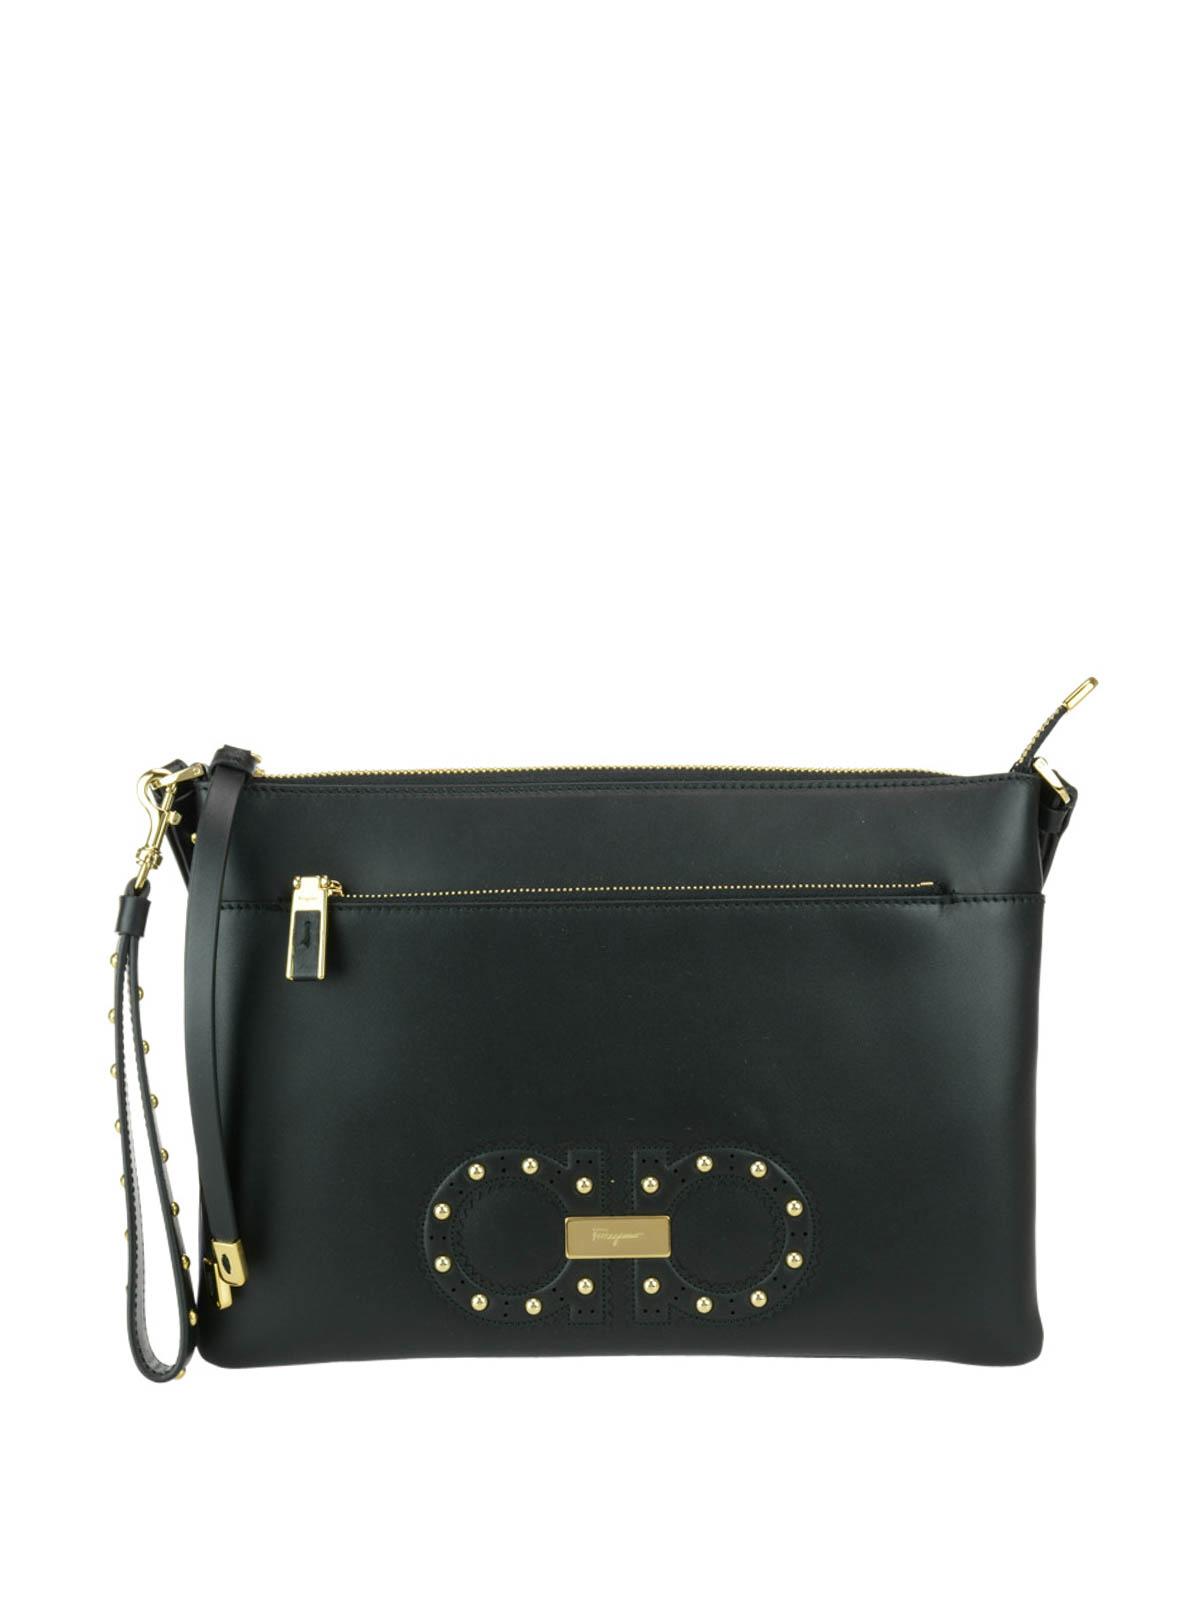 Where Can I Order Low Price Sale Online double Gancio clutch bag - Black Salvatore Ferragamo Cheap Sneakernews h3NhWNN